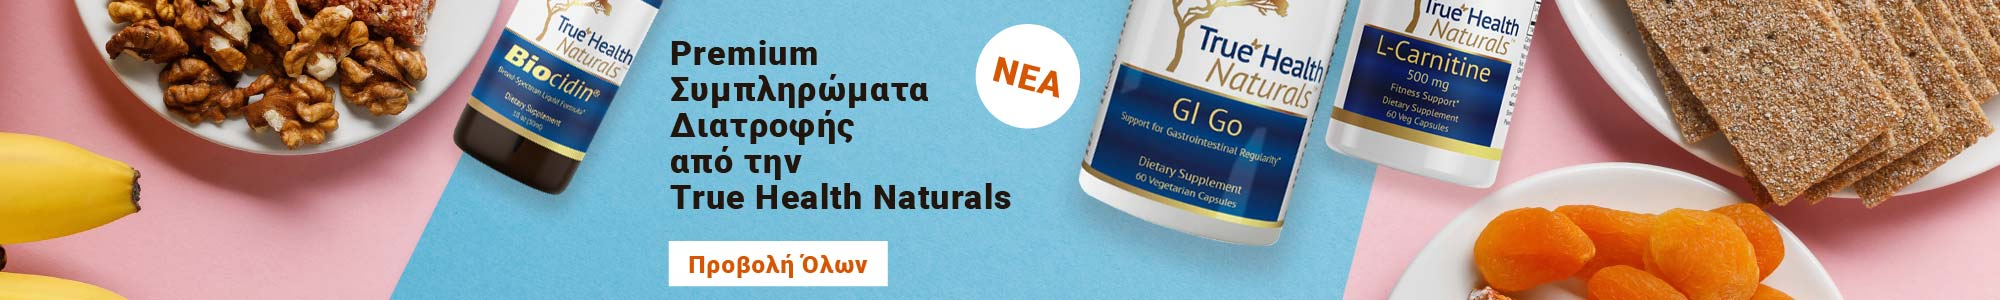 Nέα. Premium Συμπληρώματα Διατροφής από την True Health Naturals. Προβολή Όλων